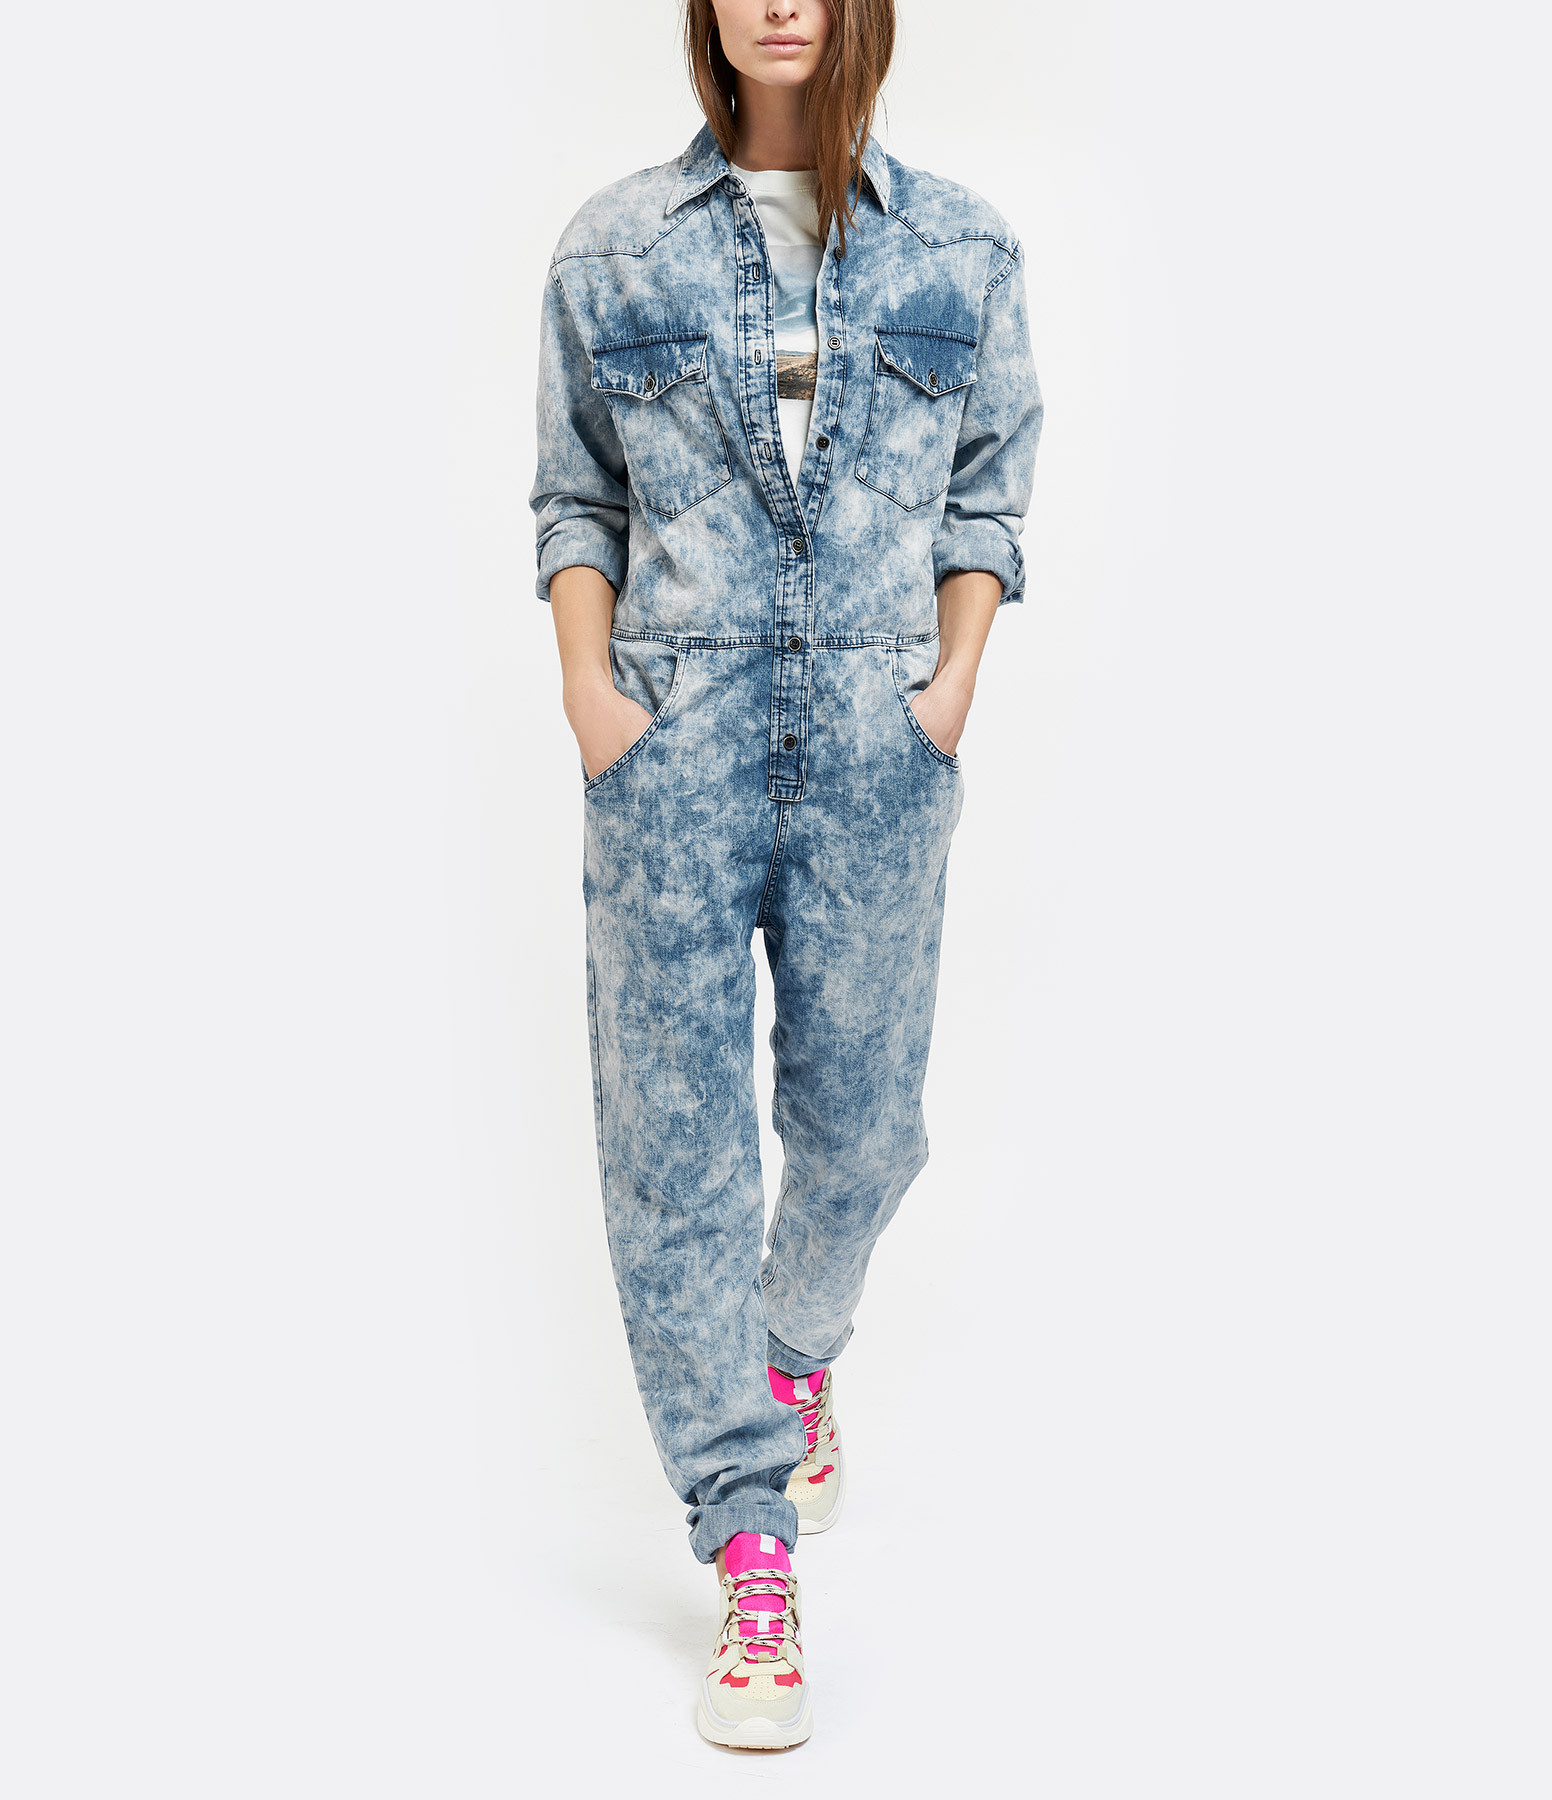 ISABEL MARANT ÉTOILE - Combinaison Idesia Coton Bleu